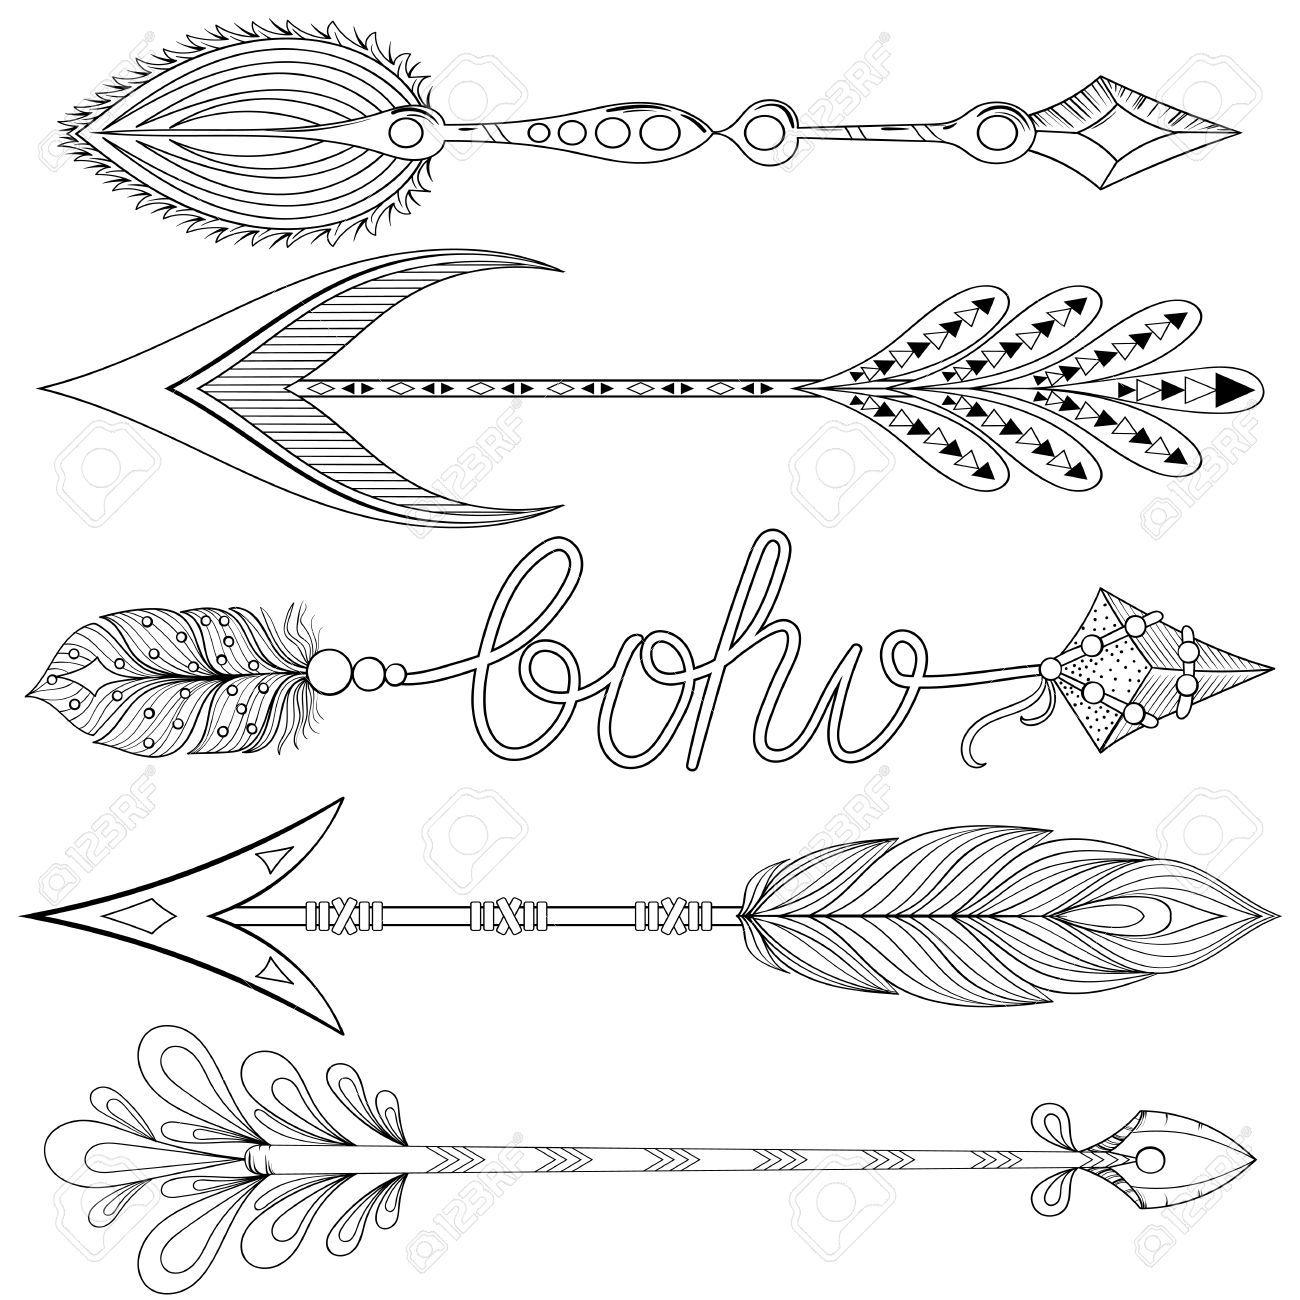 1300x1300 Bohemian Arrows Set With Feathers. Hand Drawn Decorative Arrows